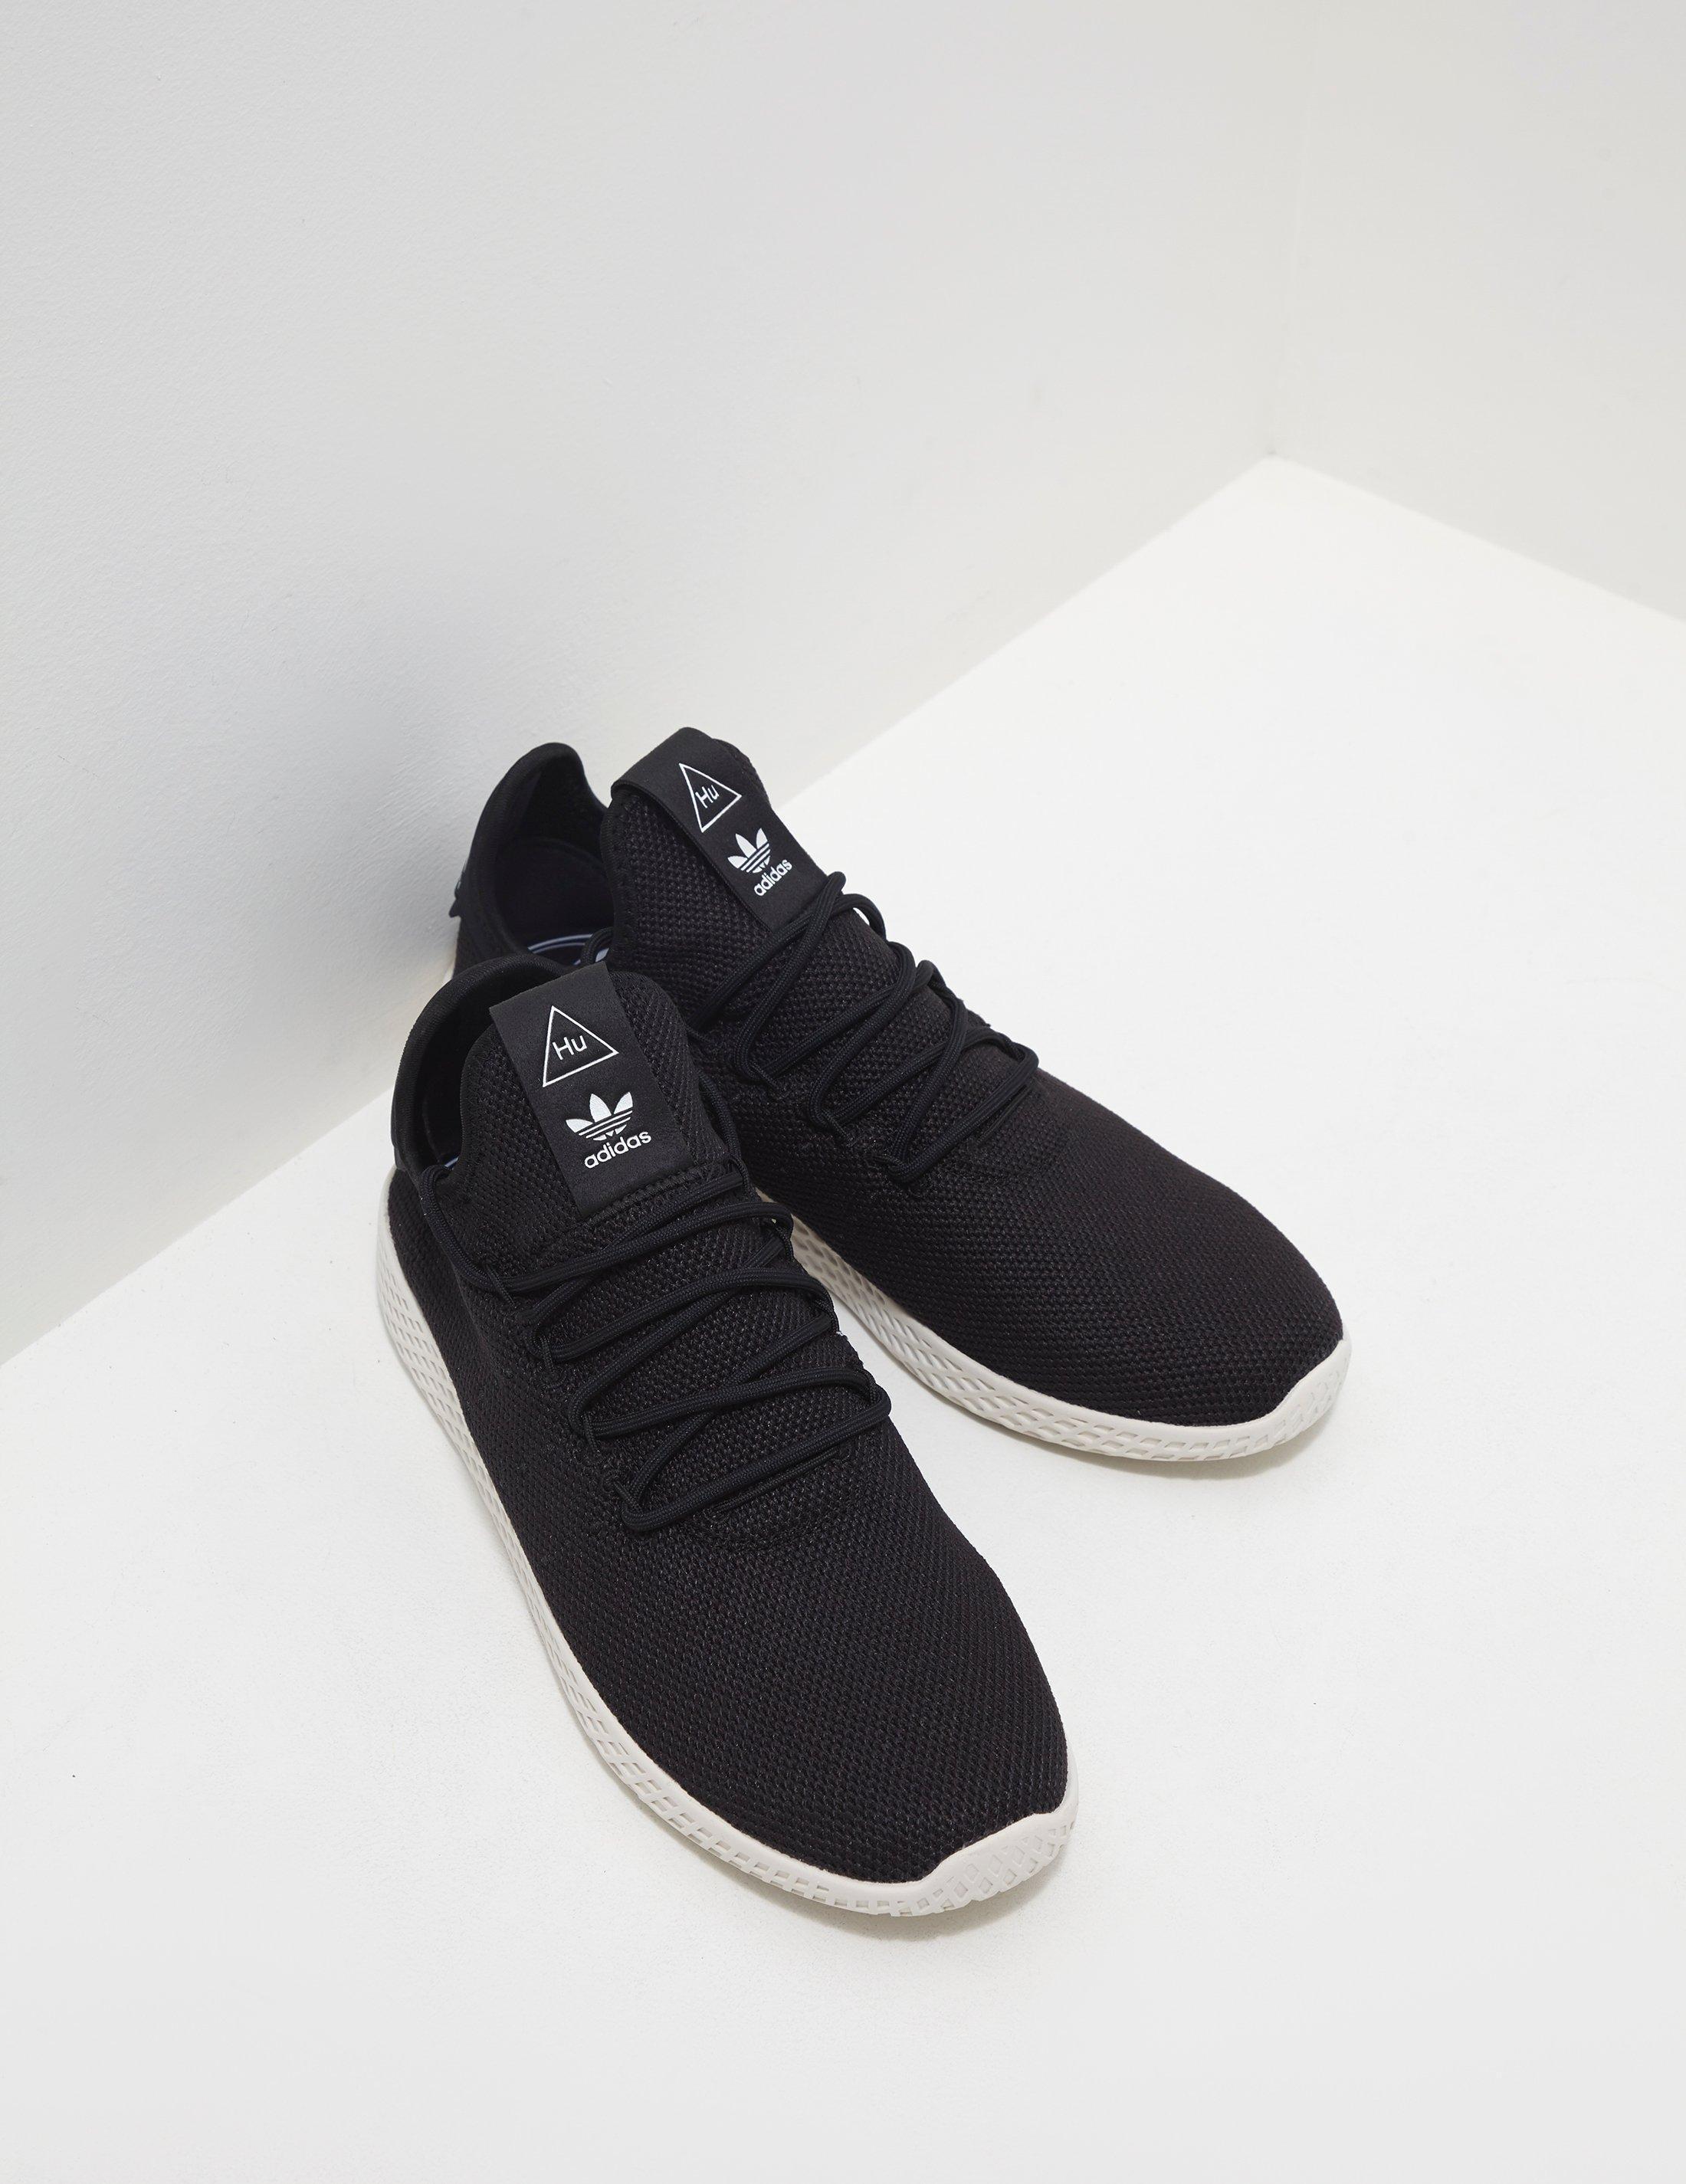 adidas pharrell williams tennis hu black